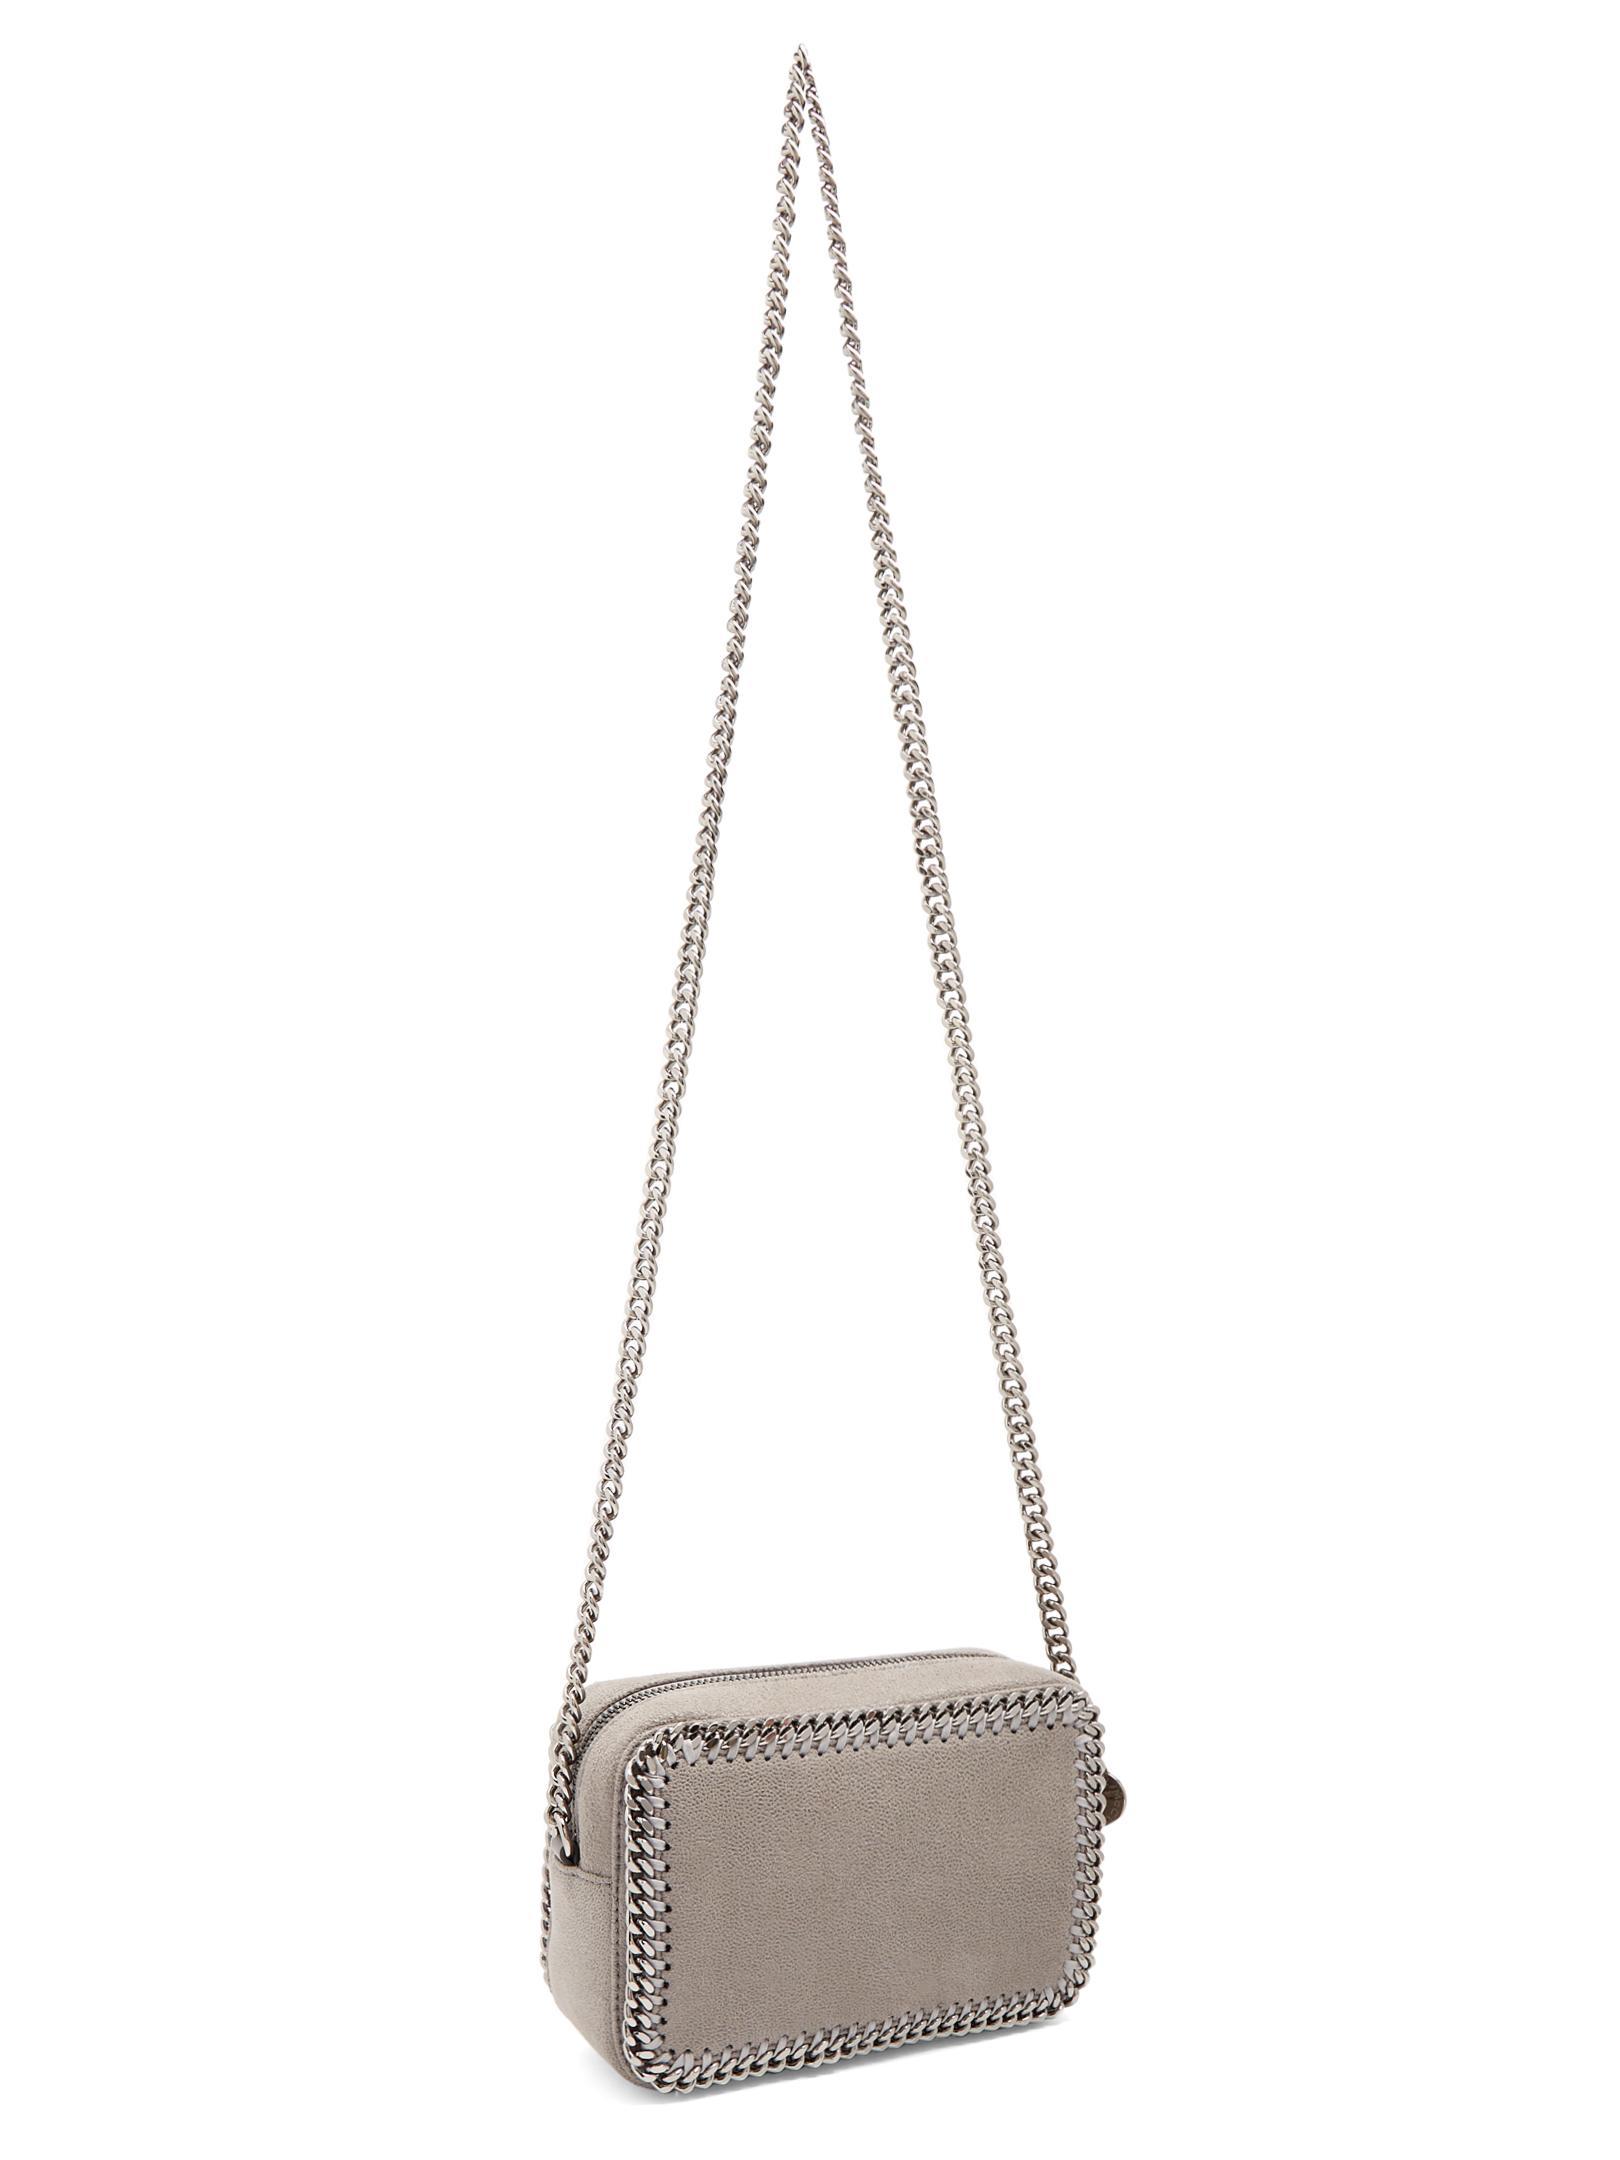 Stella McCartney Falabella Camera Faux-suede Cross-body Bag in Light Grey (Grey)